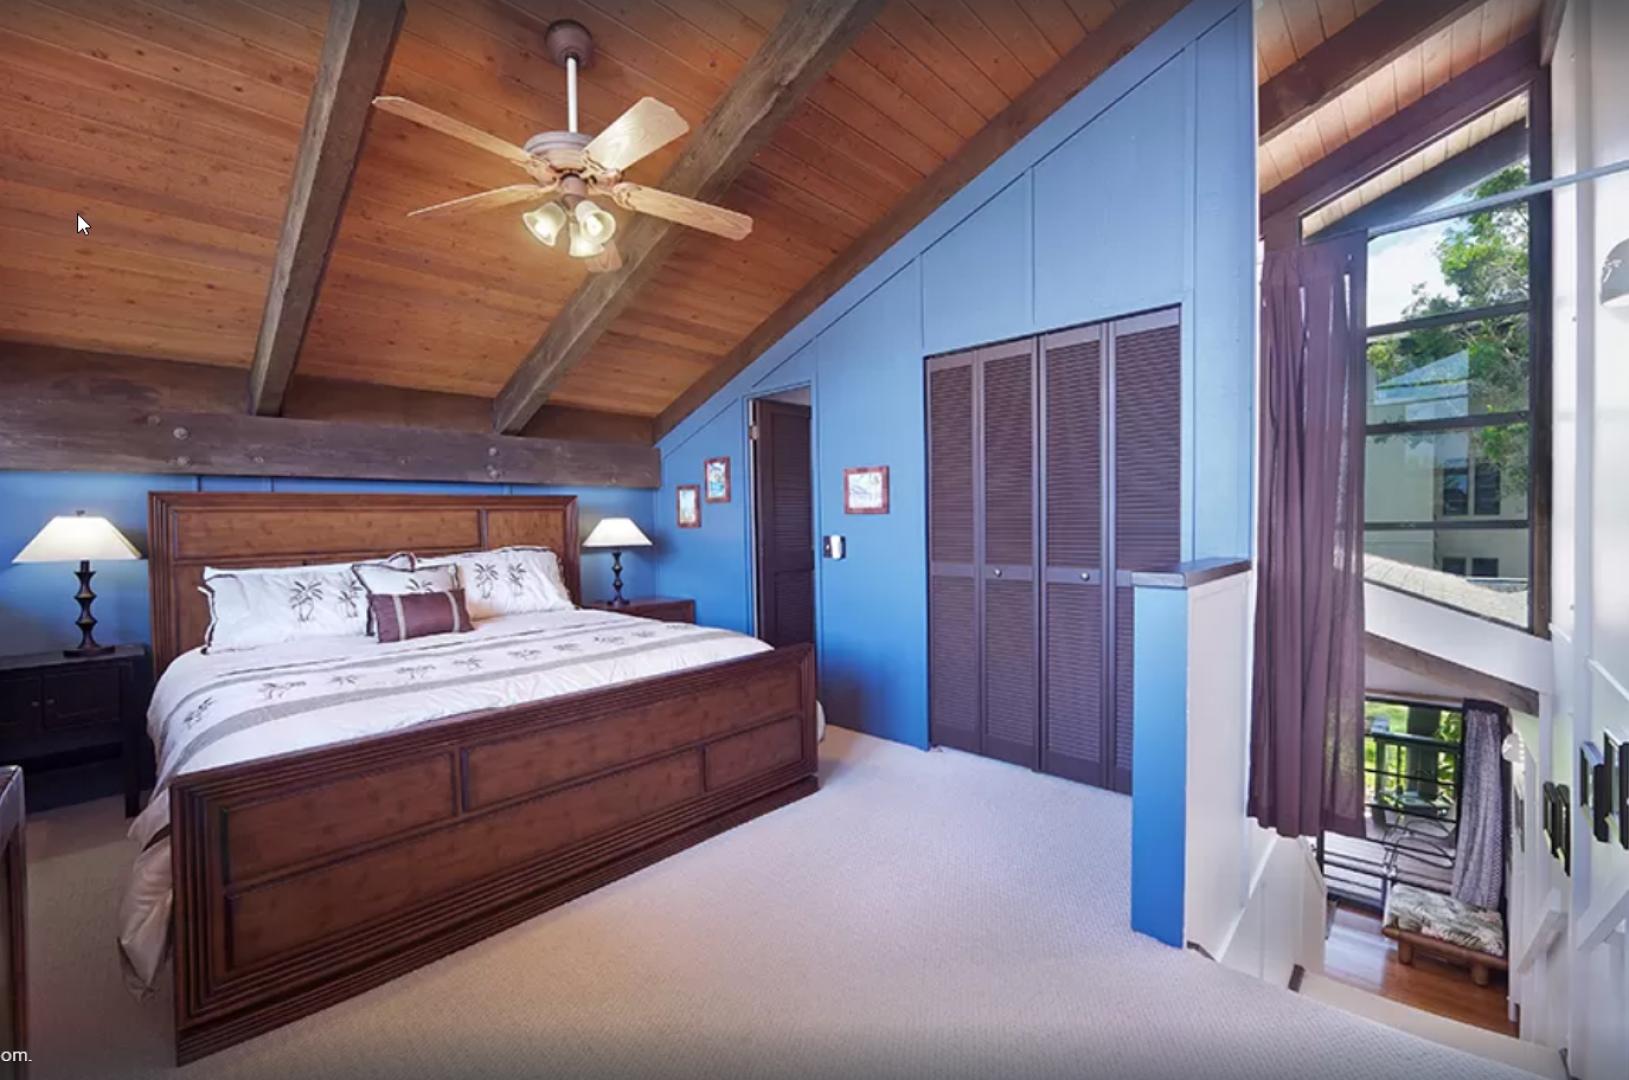 The loft bedroom also has an en suite bath